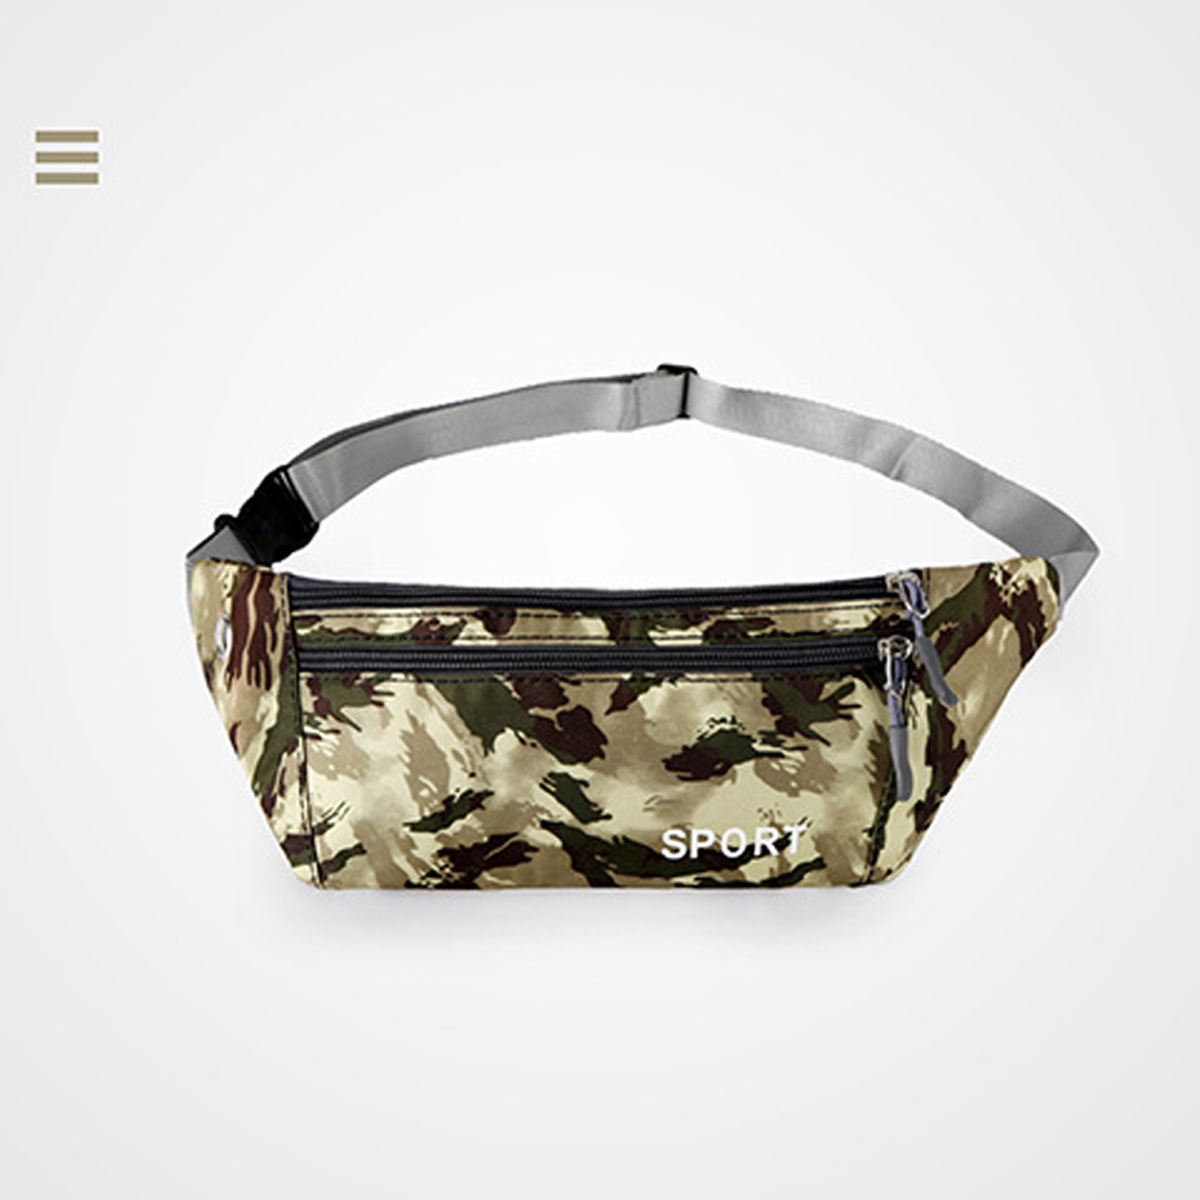 Camouflage Waist Pack Waterproof Belt Hip Bum Military Bag Pouch Running  Pockets Mountaineering Mobile Phone Bag Waist Packs